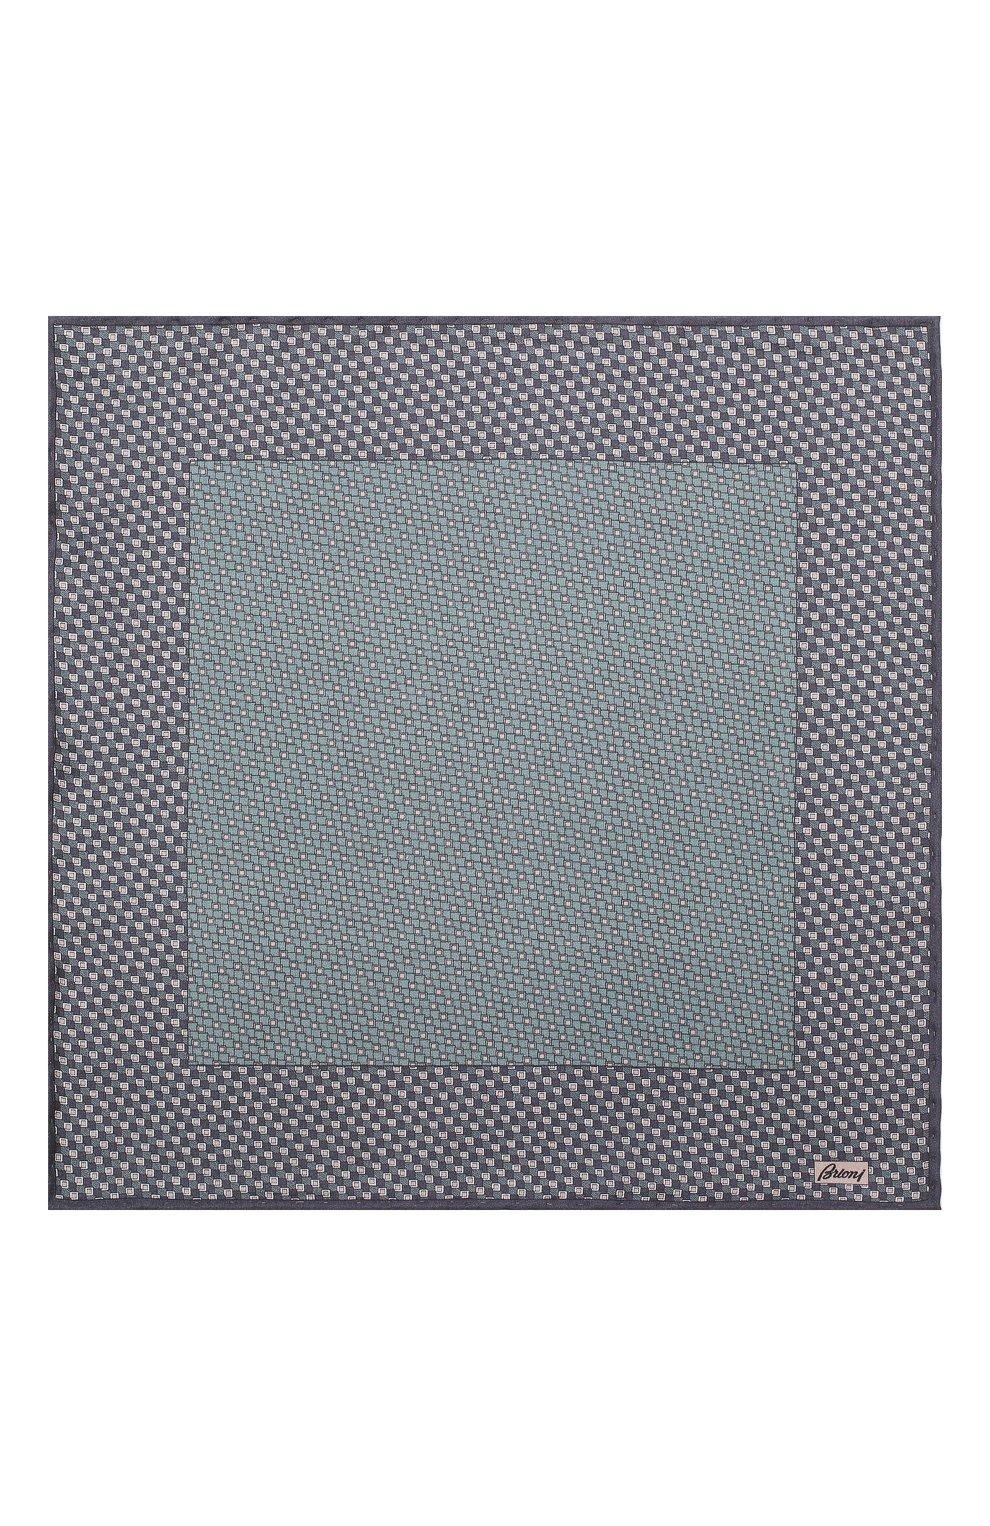 Мужской комплект из галстука и платка BRIONI синего цвета, арт. 08A900/08477 | Фото 6